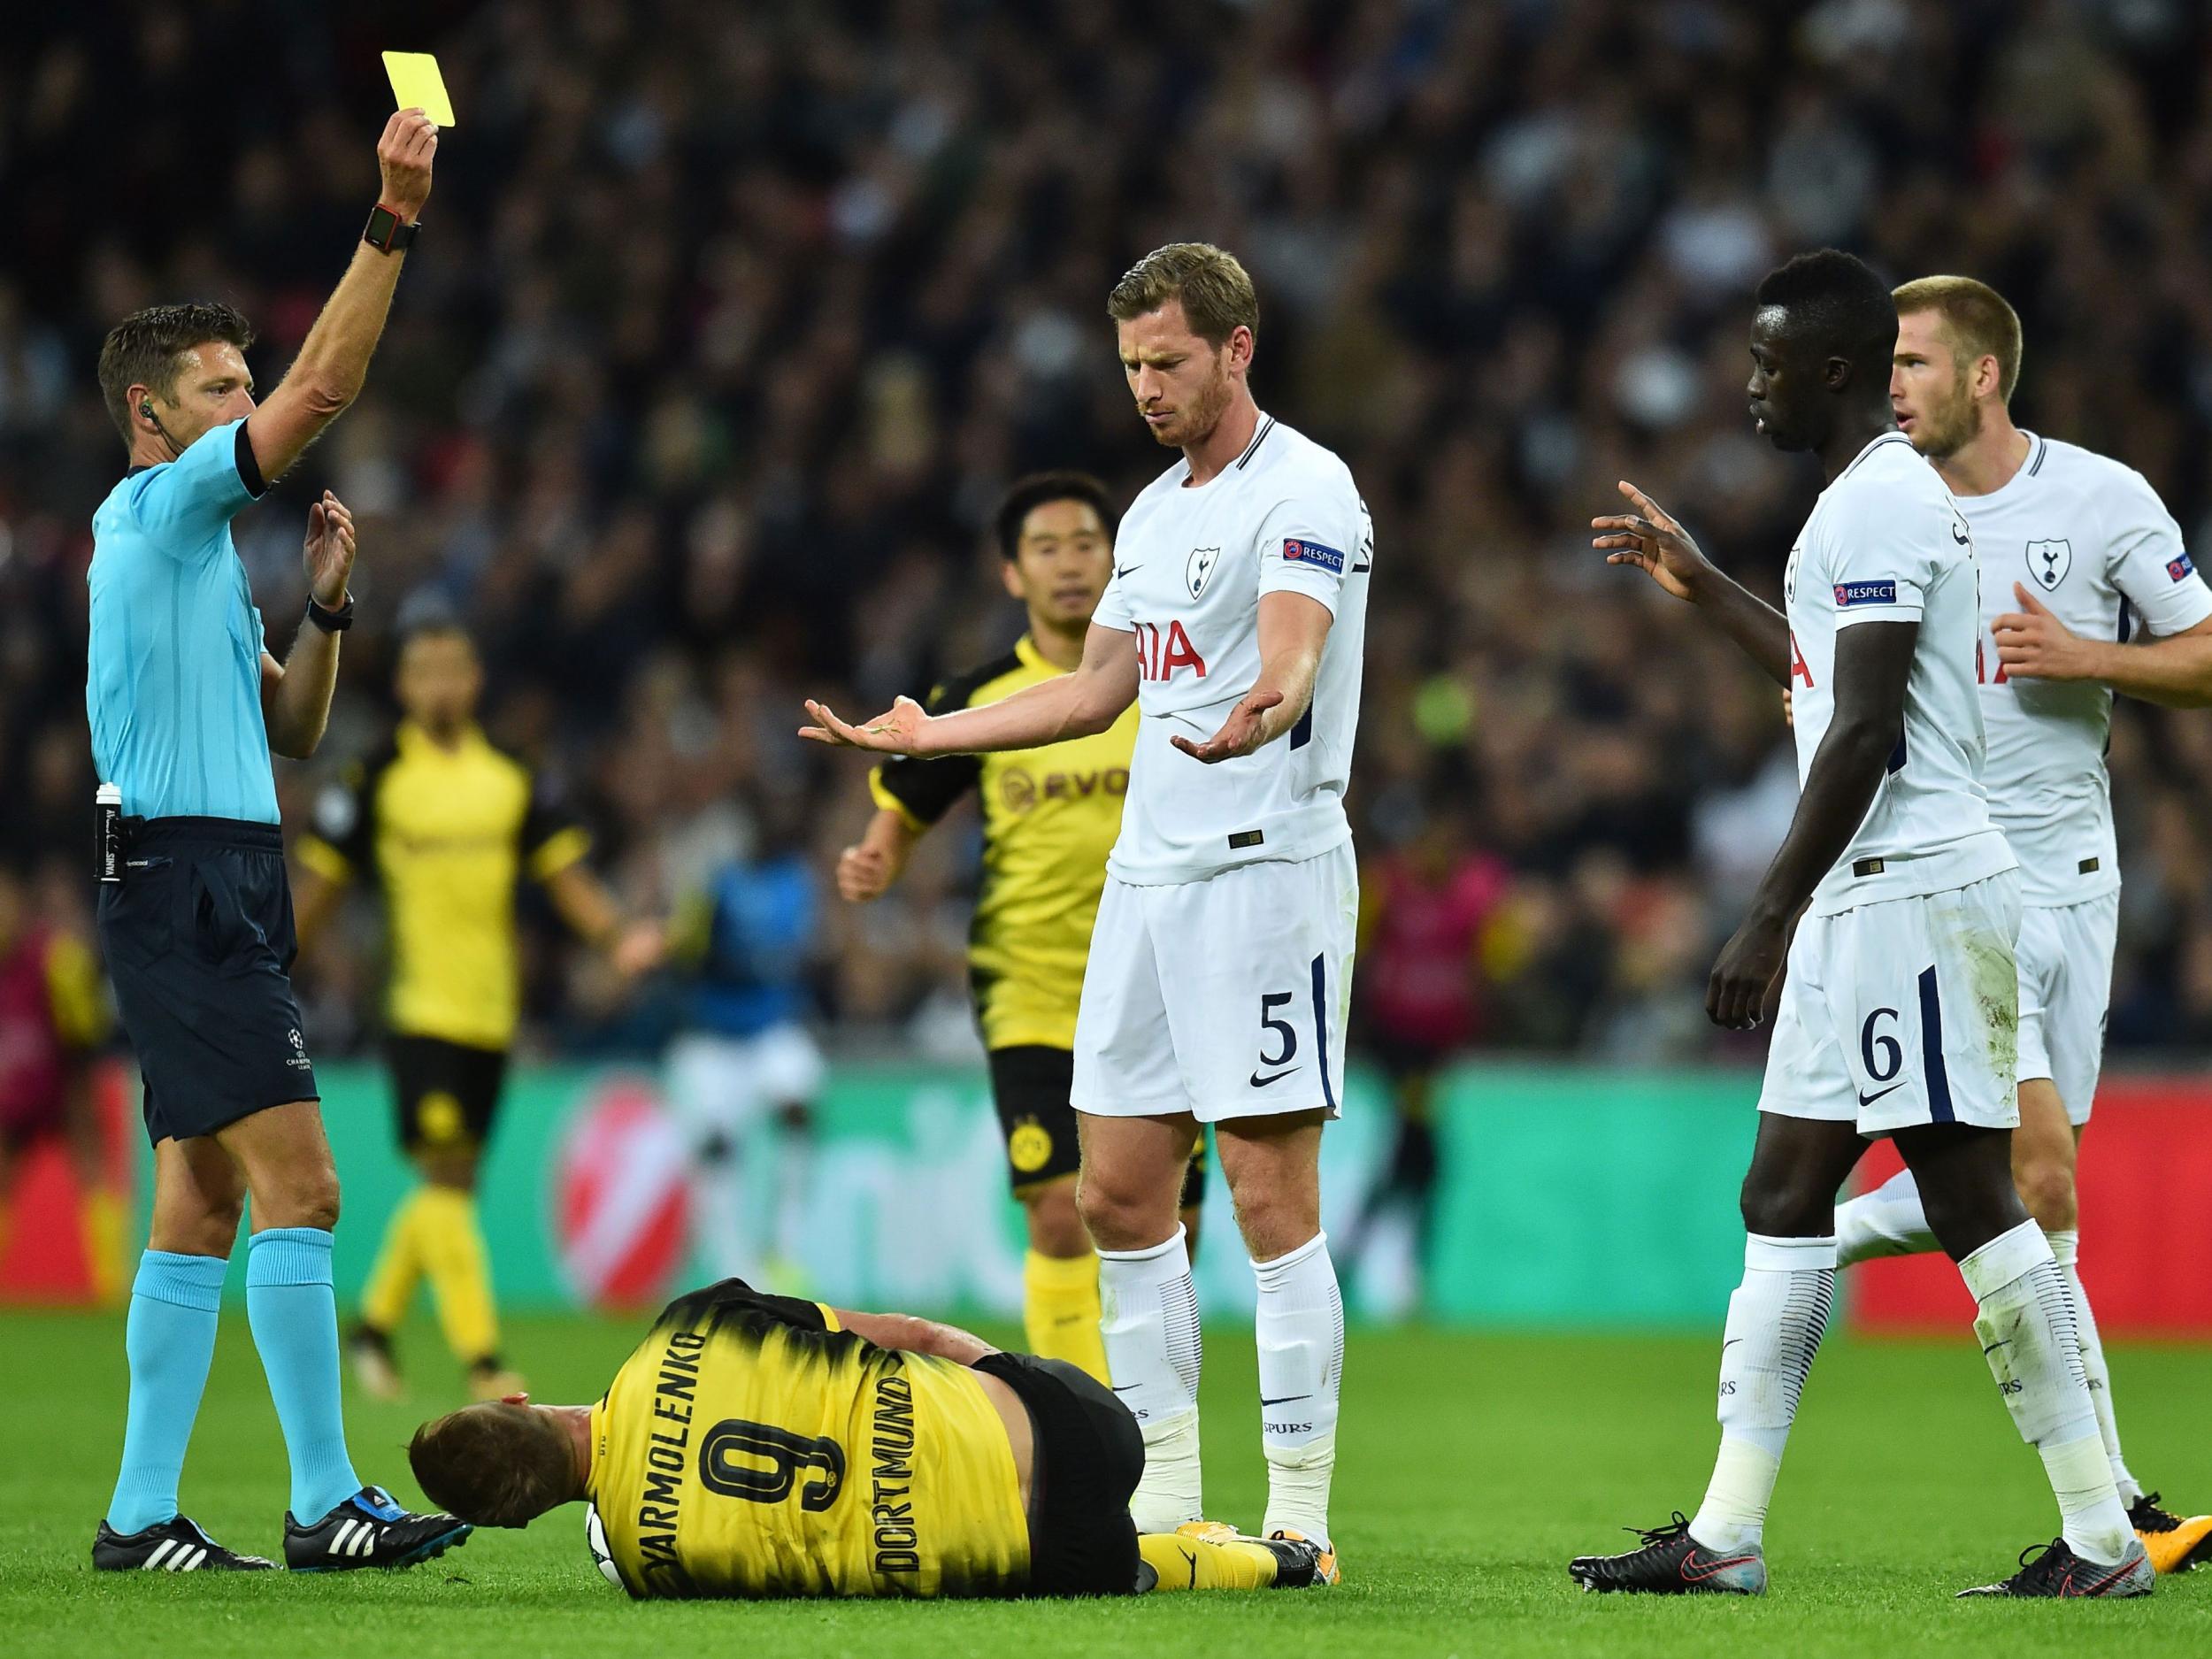 Tottenham s Jan Vertonghen accuses Dortmund players of